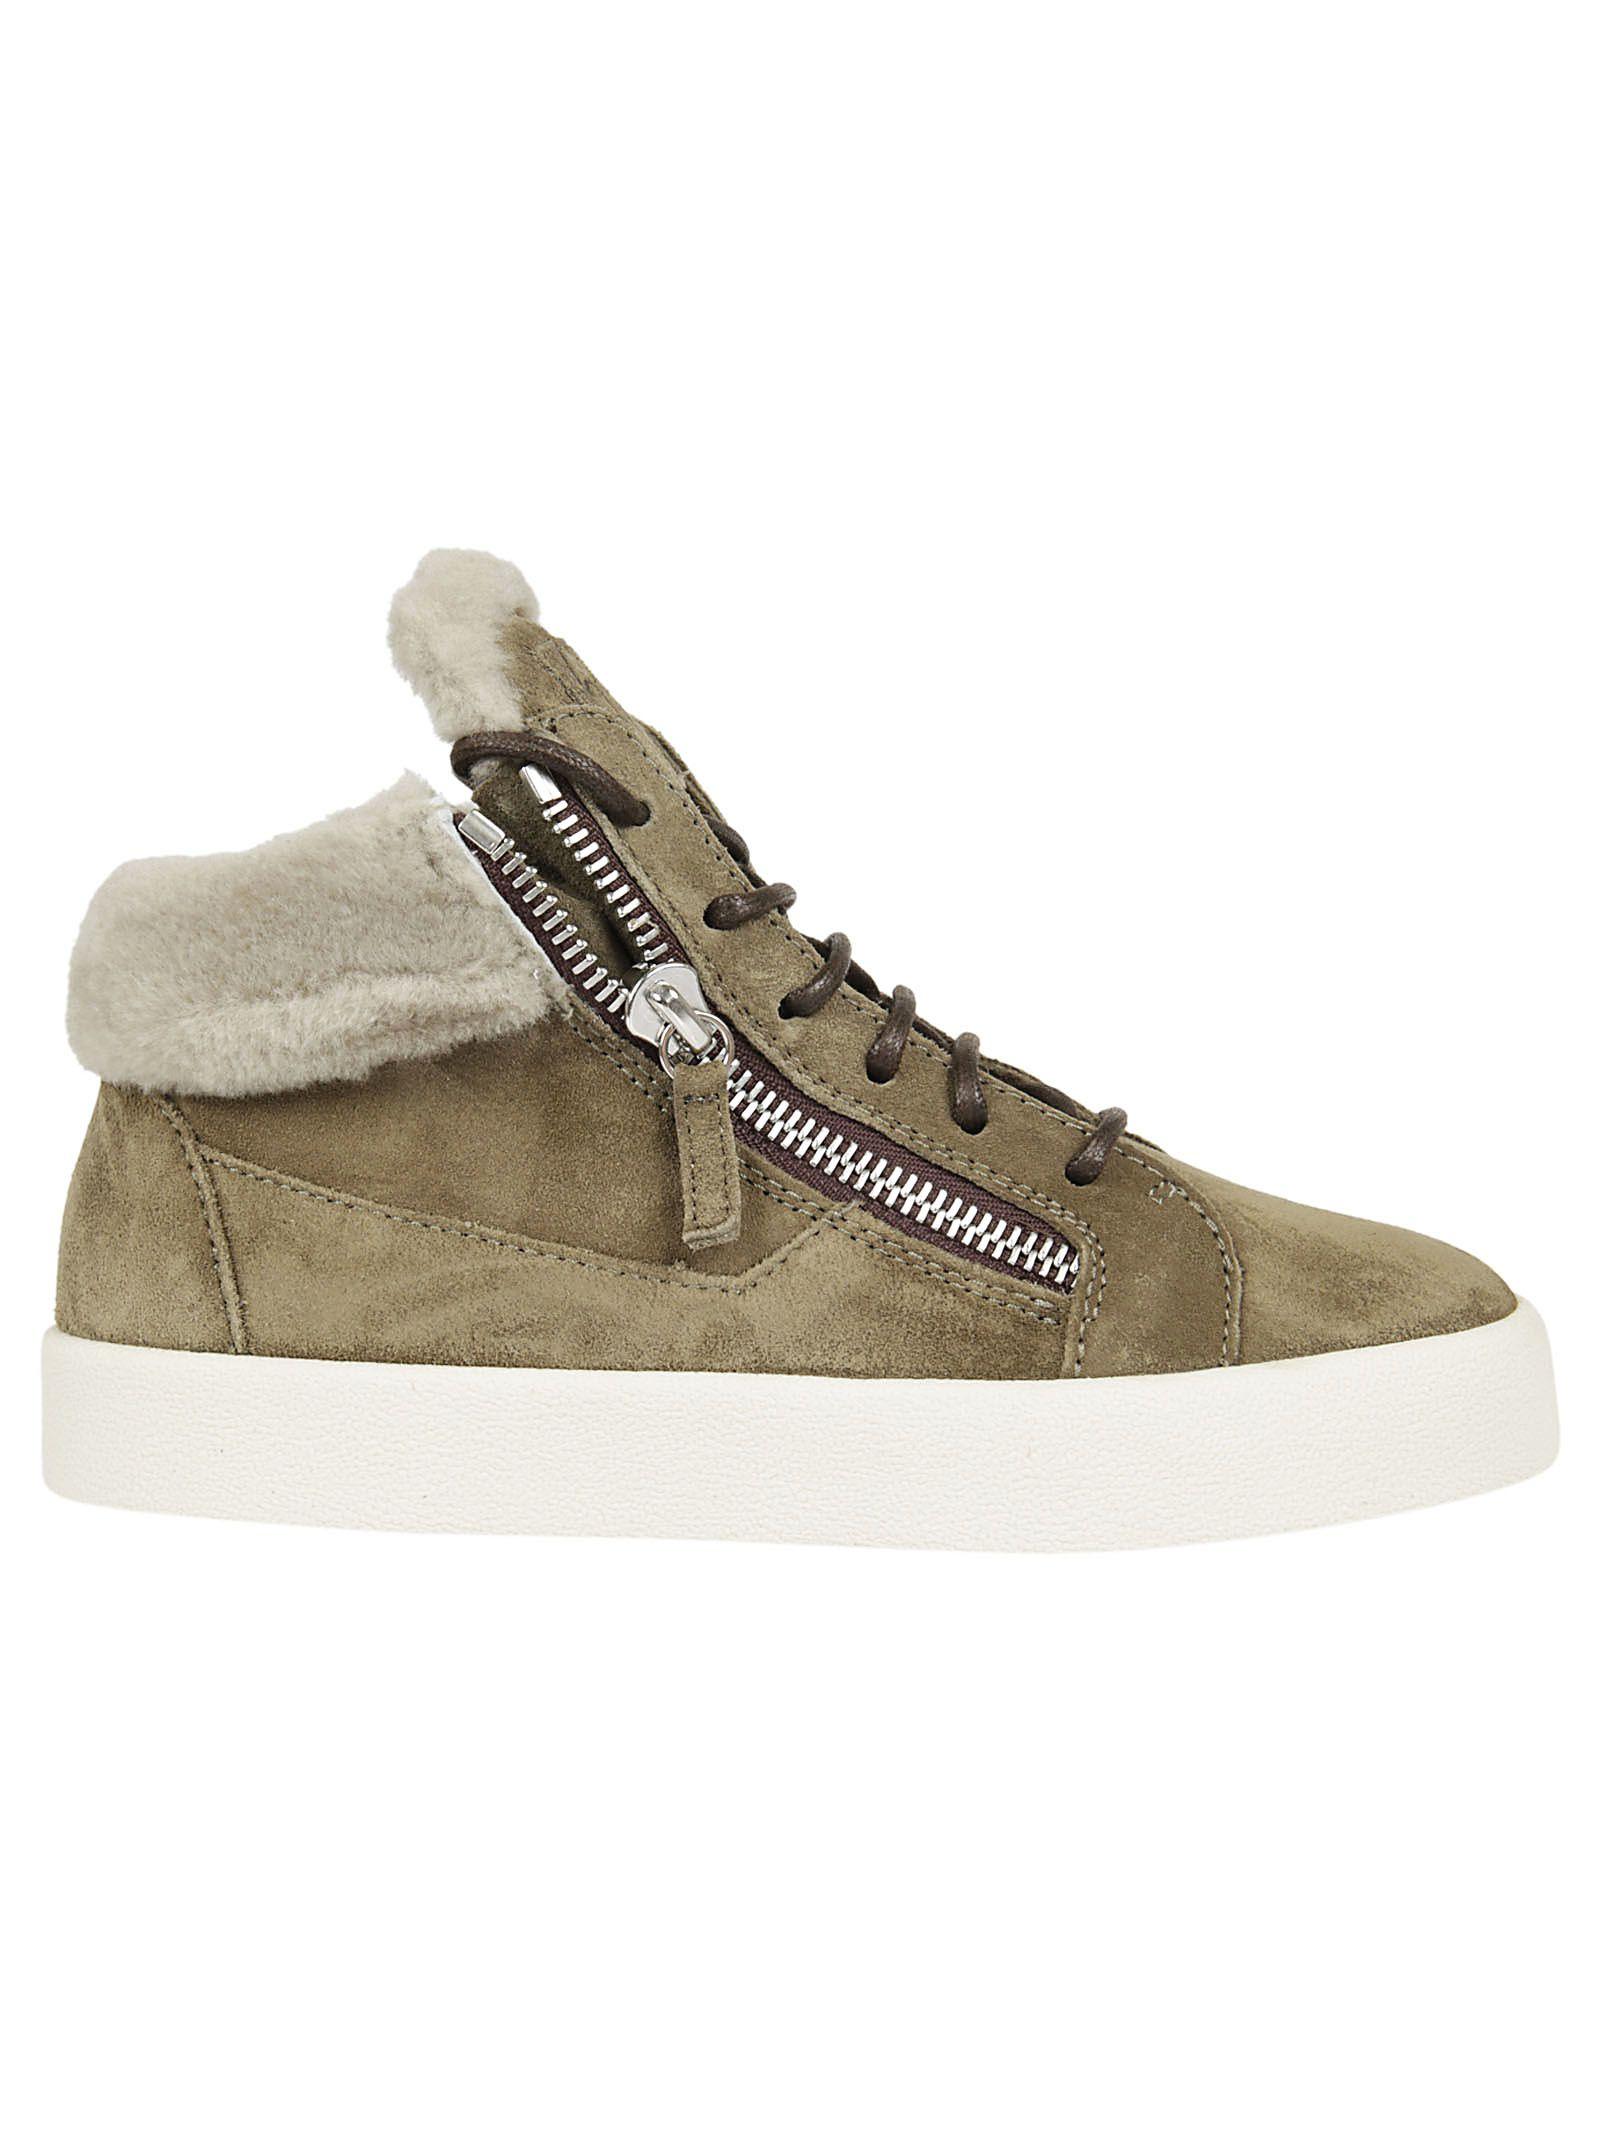 Giuseppe Zanotti Kriss Sneakers